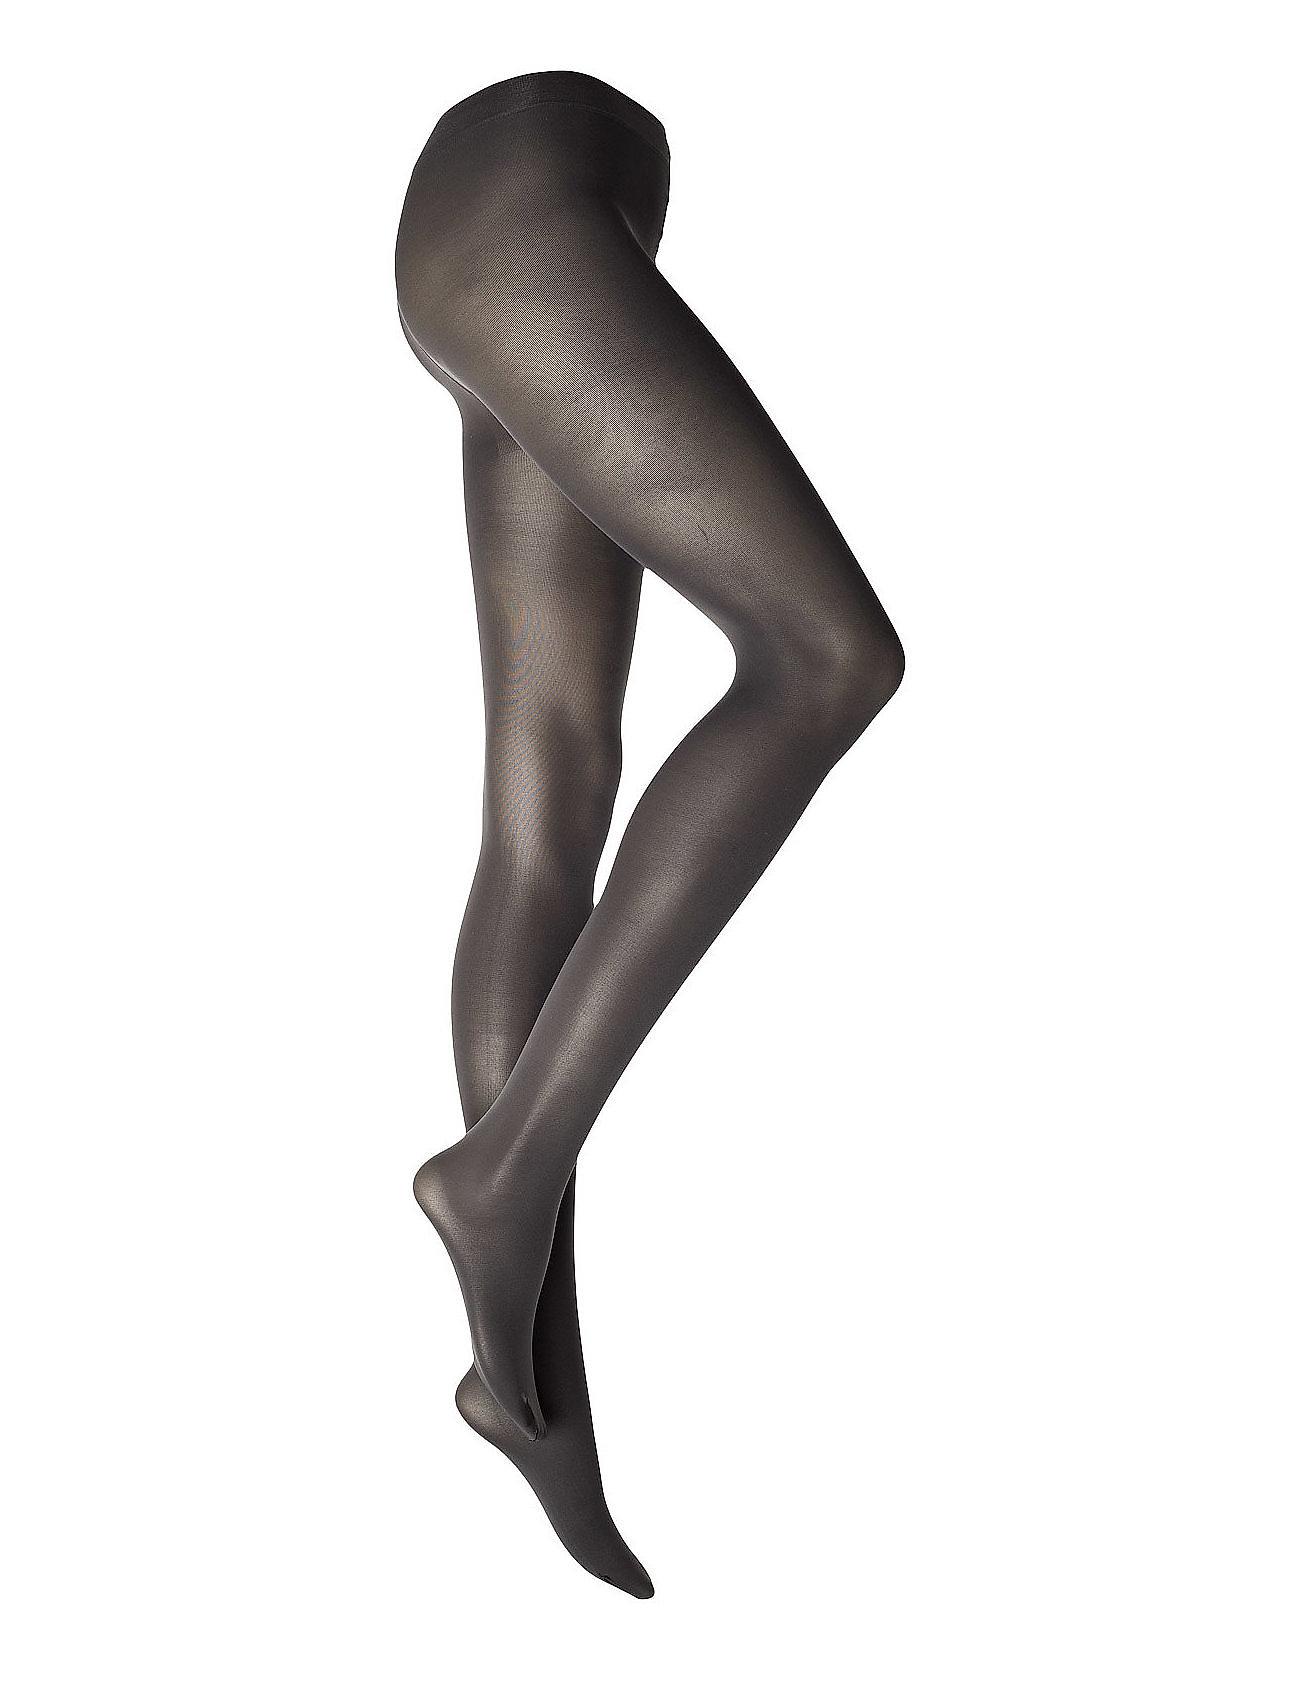 Lisbona Max Mara Hosiery Strømpebukser til Kvinder i Antracit grå